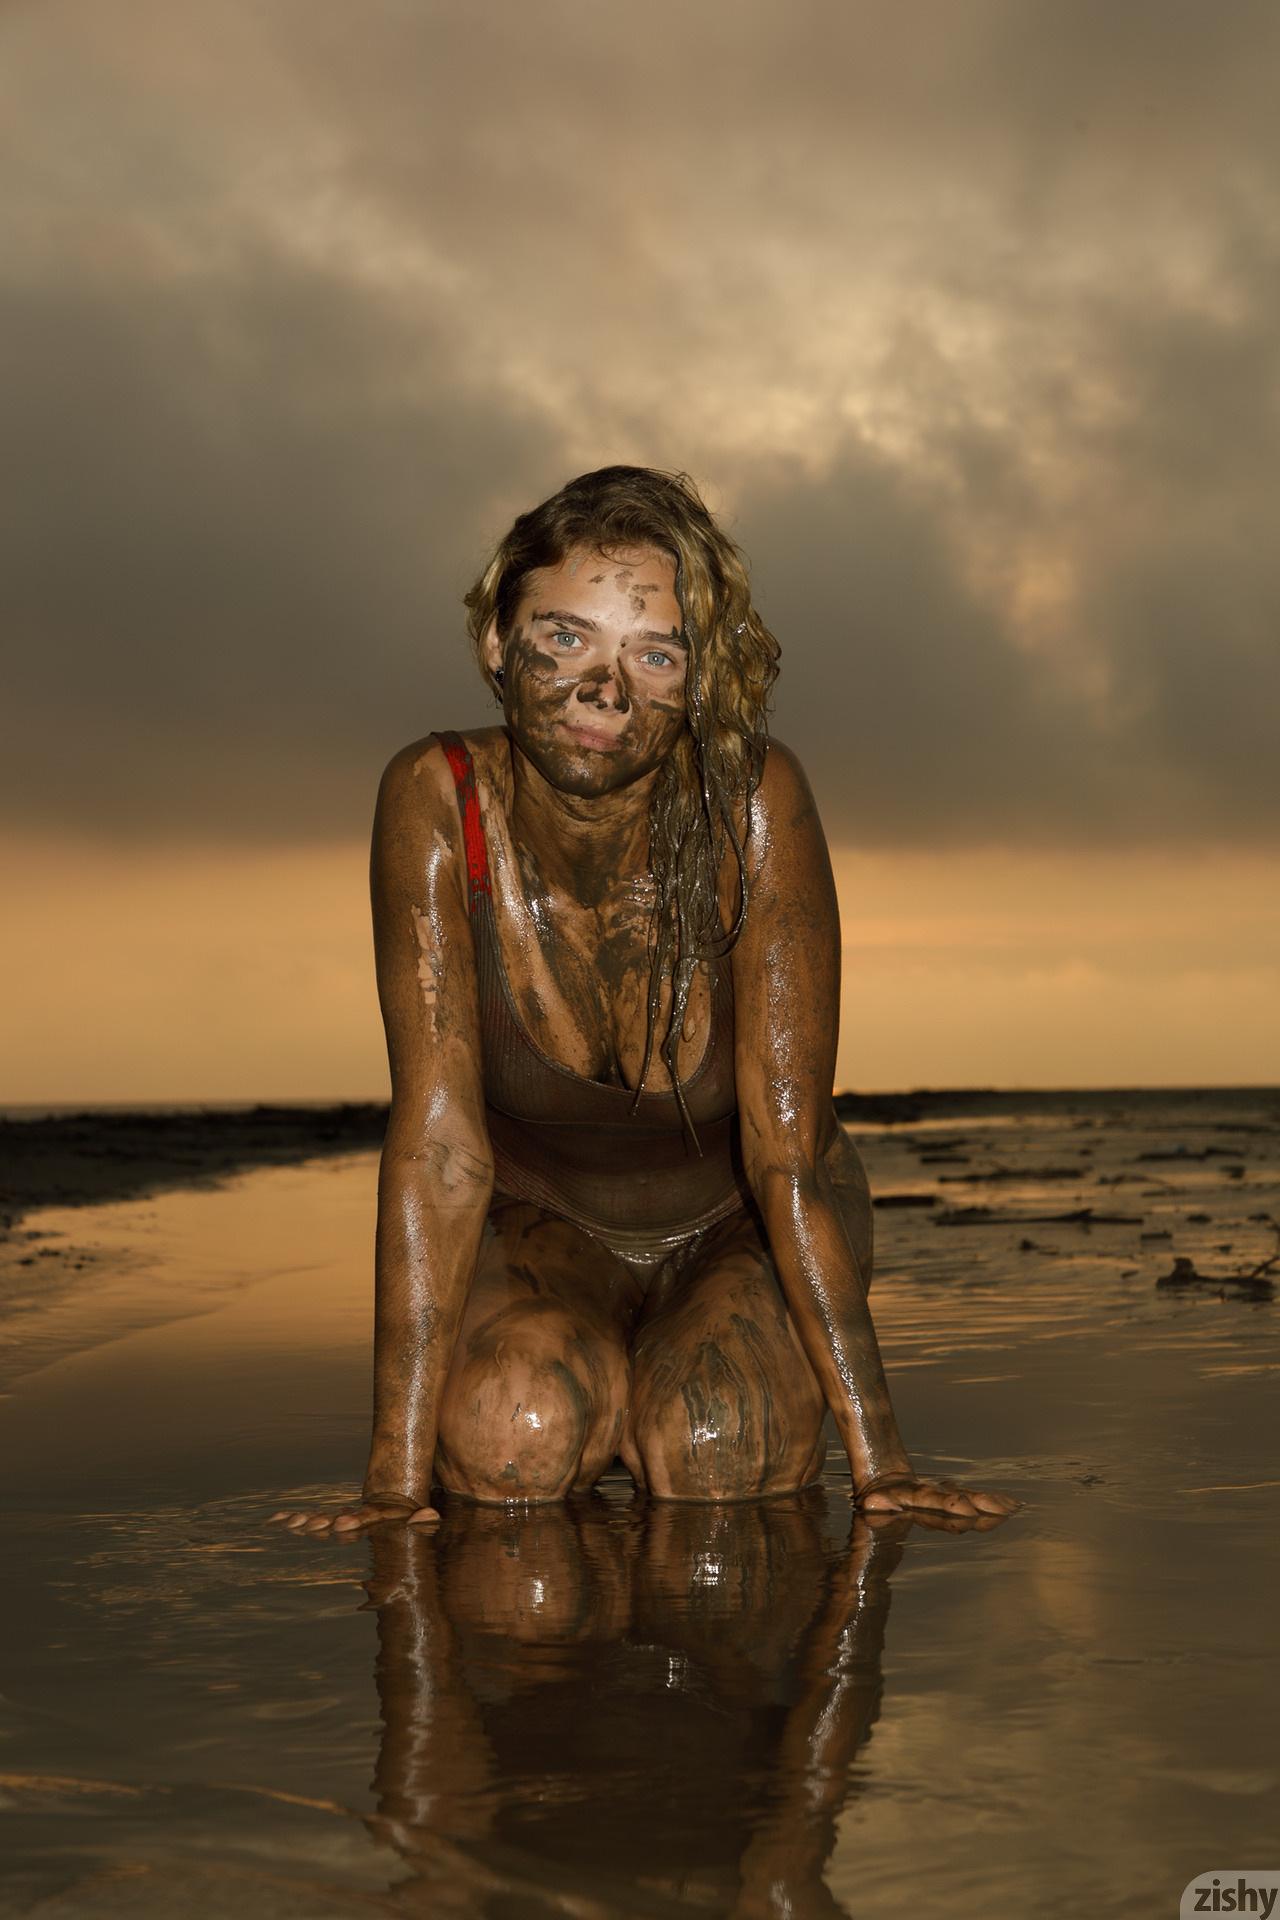 Sofia Orlova On Gryaznyy Beach Zishy (48)